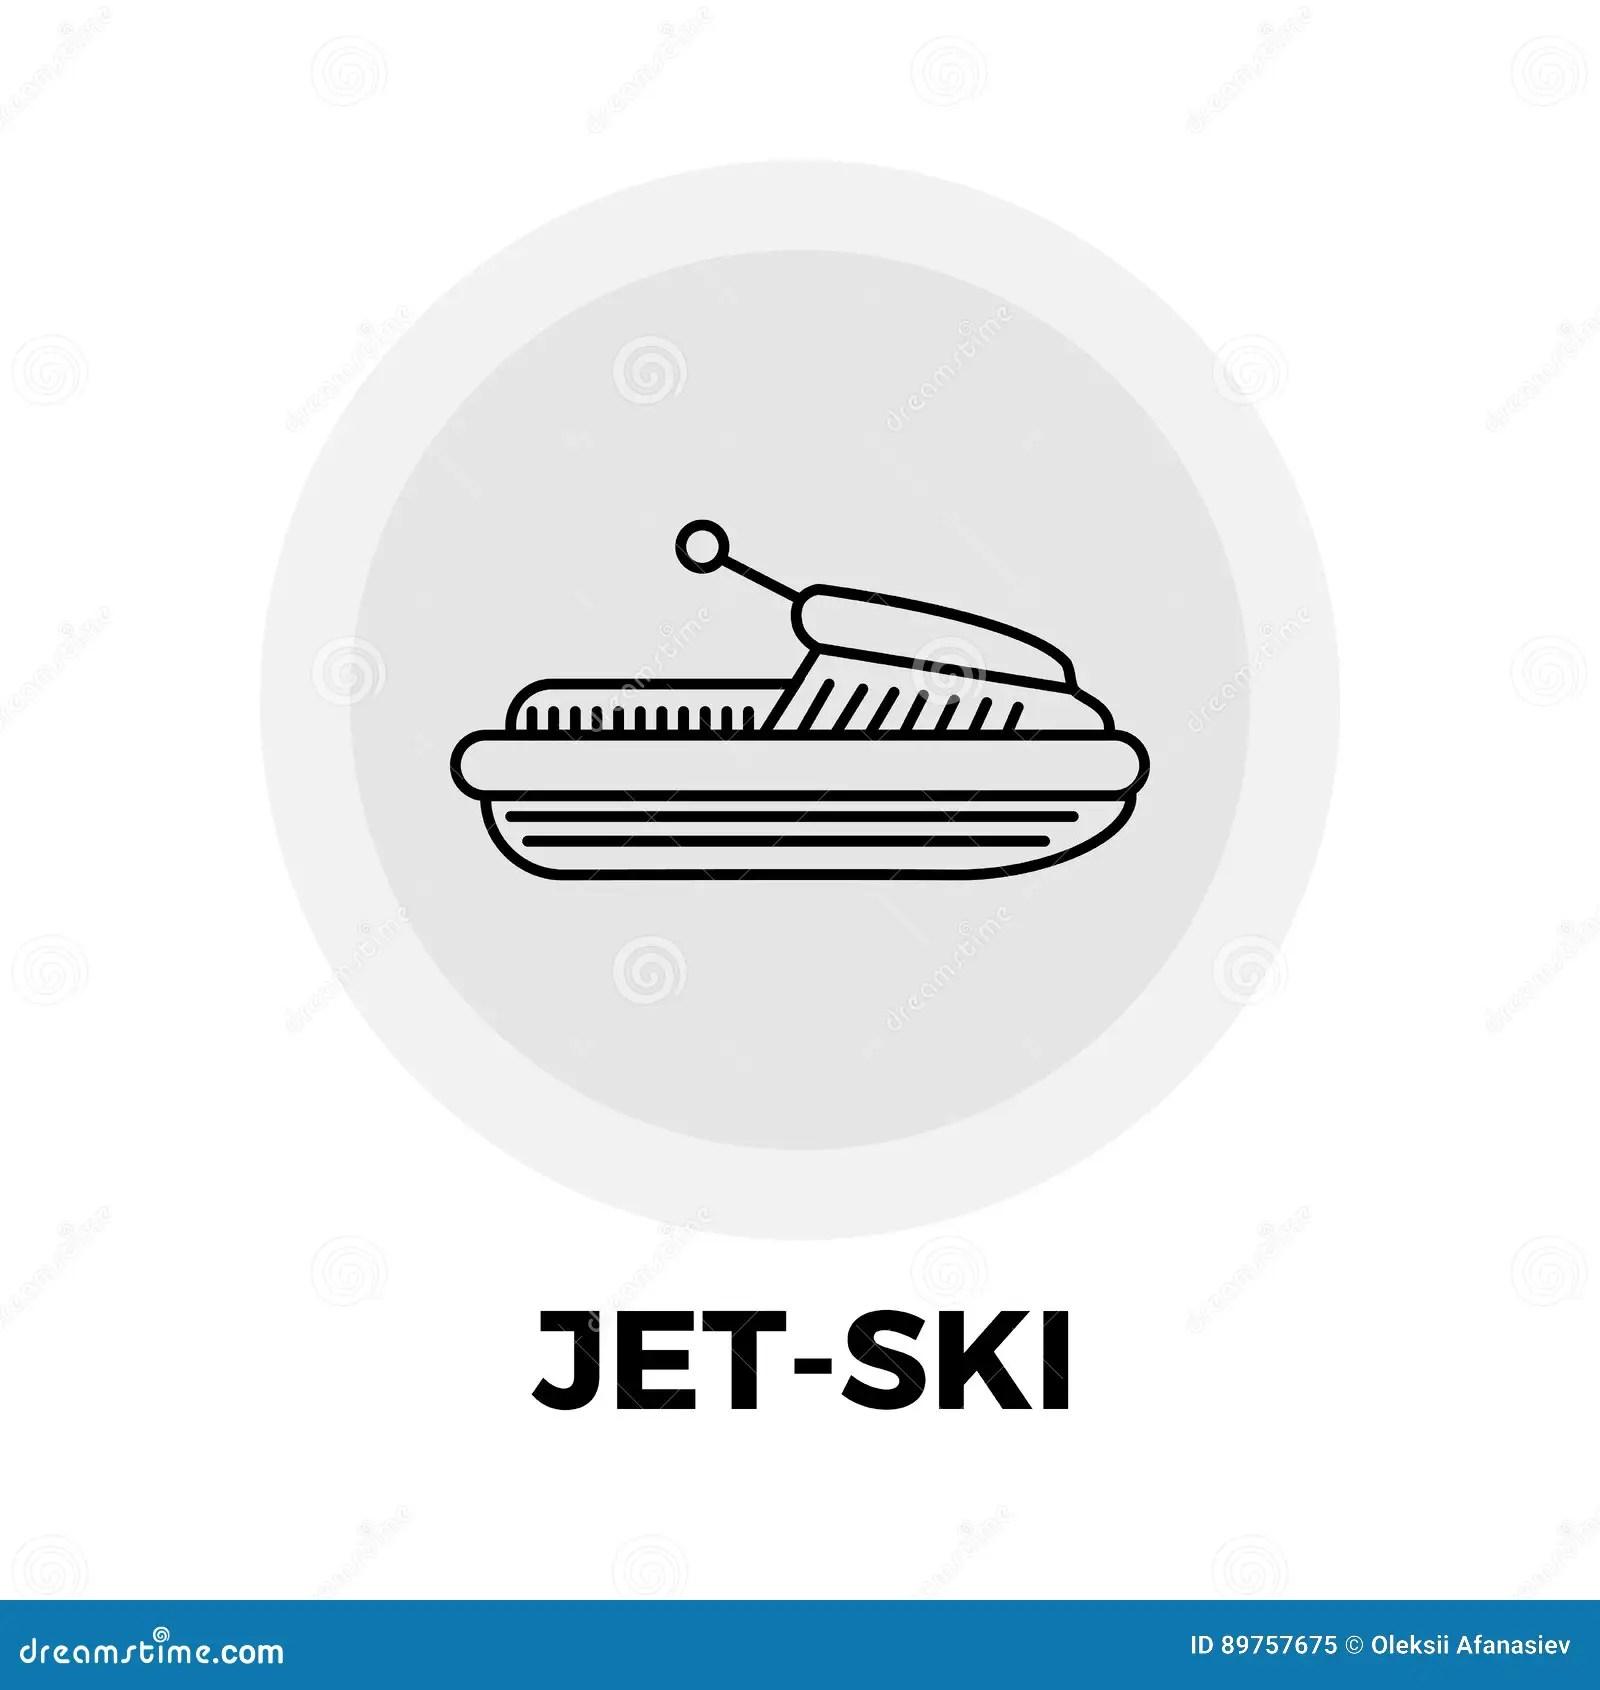 Jet-Ski Line Icon stock vector. Illustration of outline